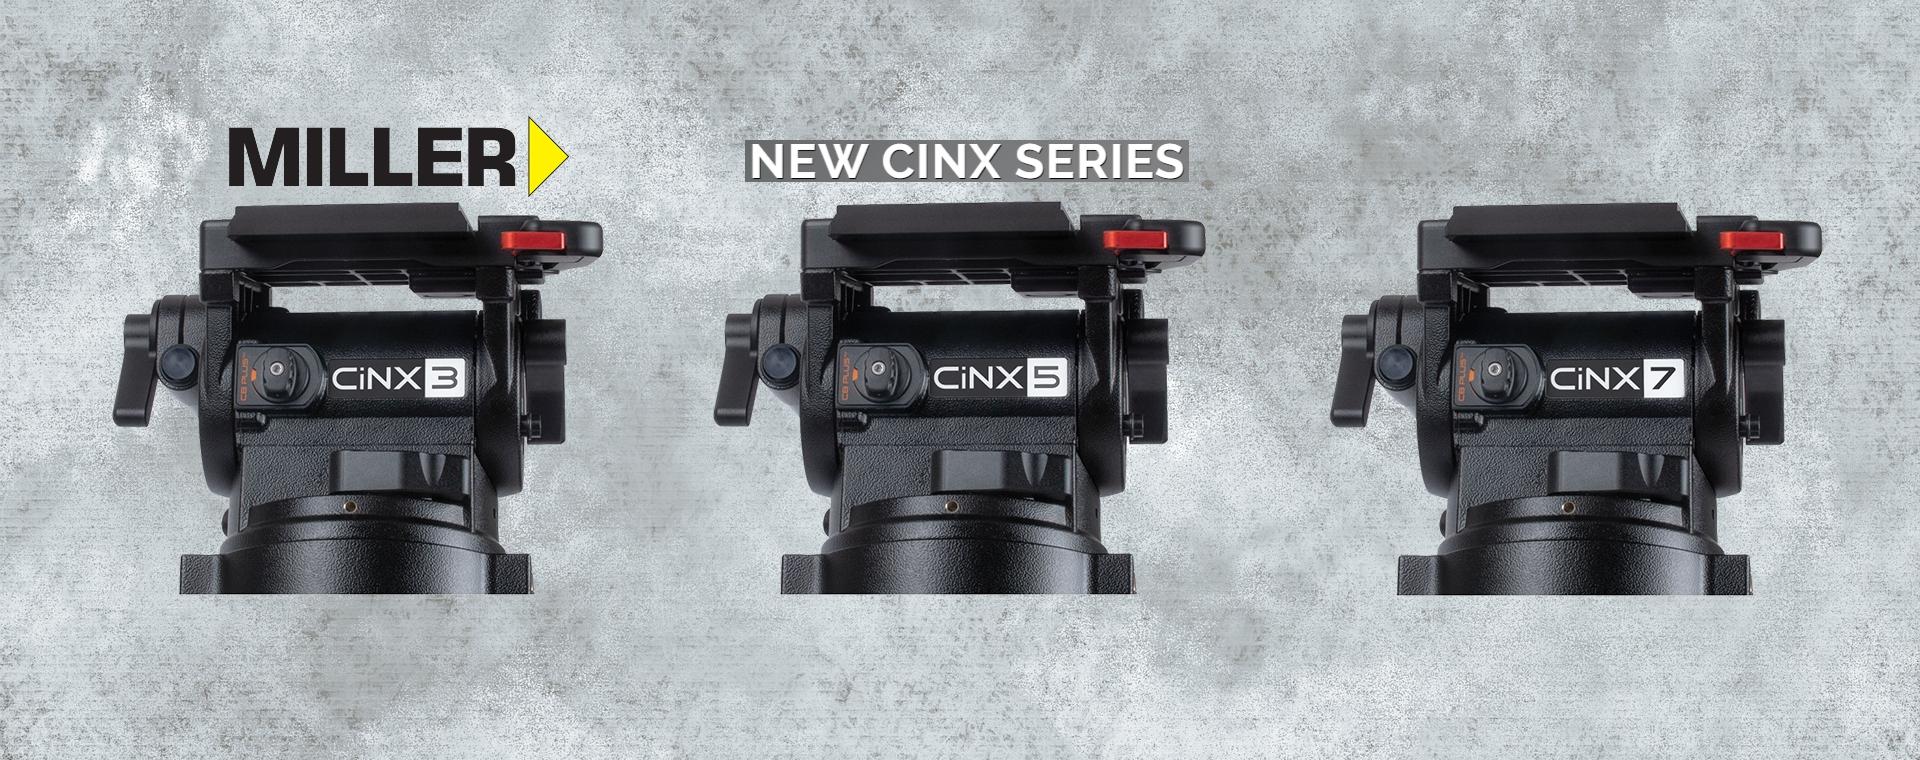 CiNX Series